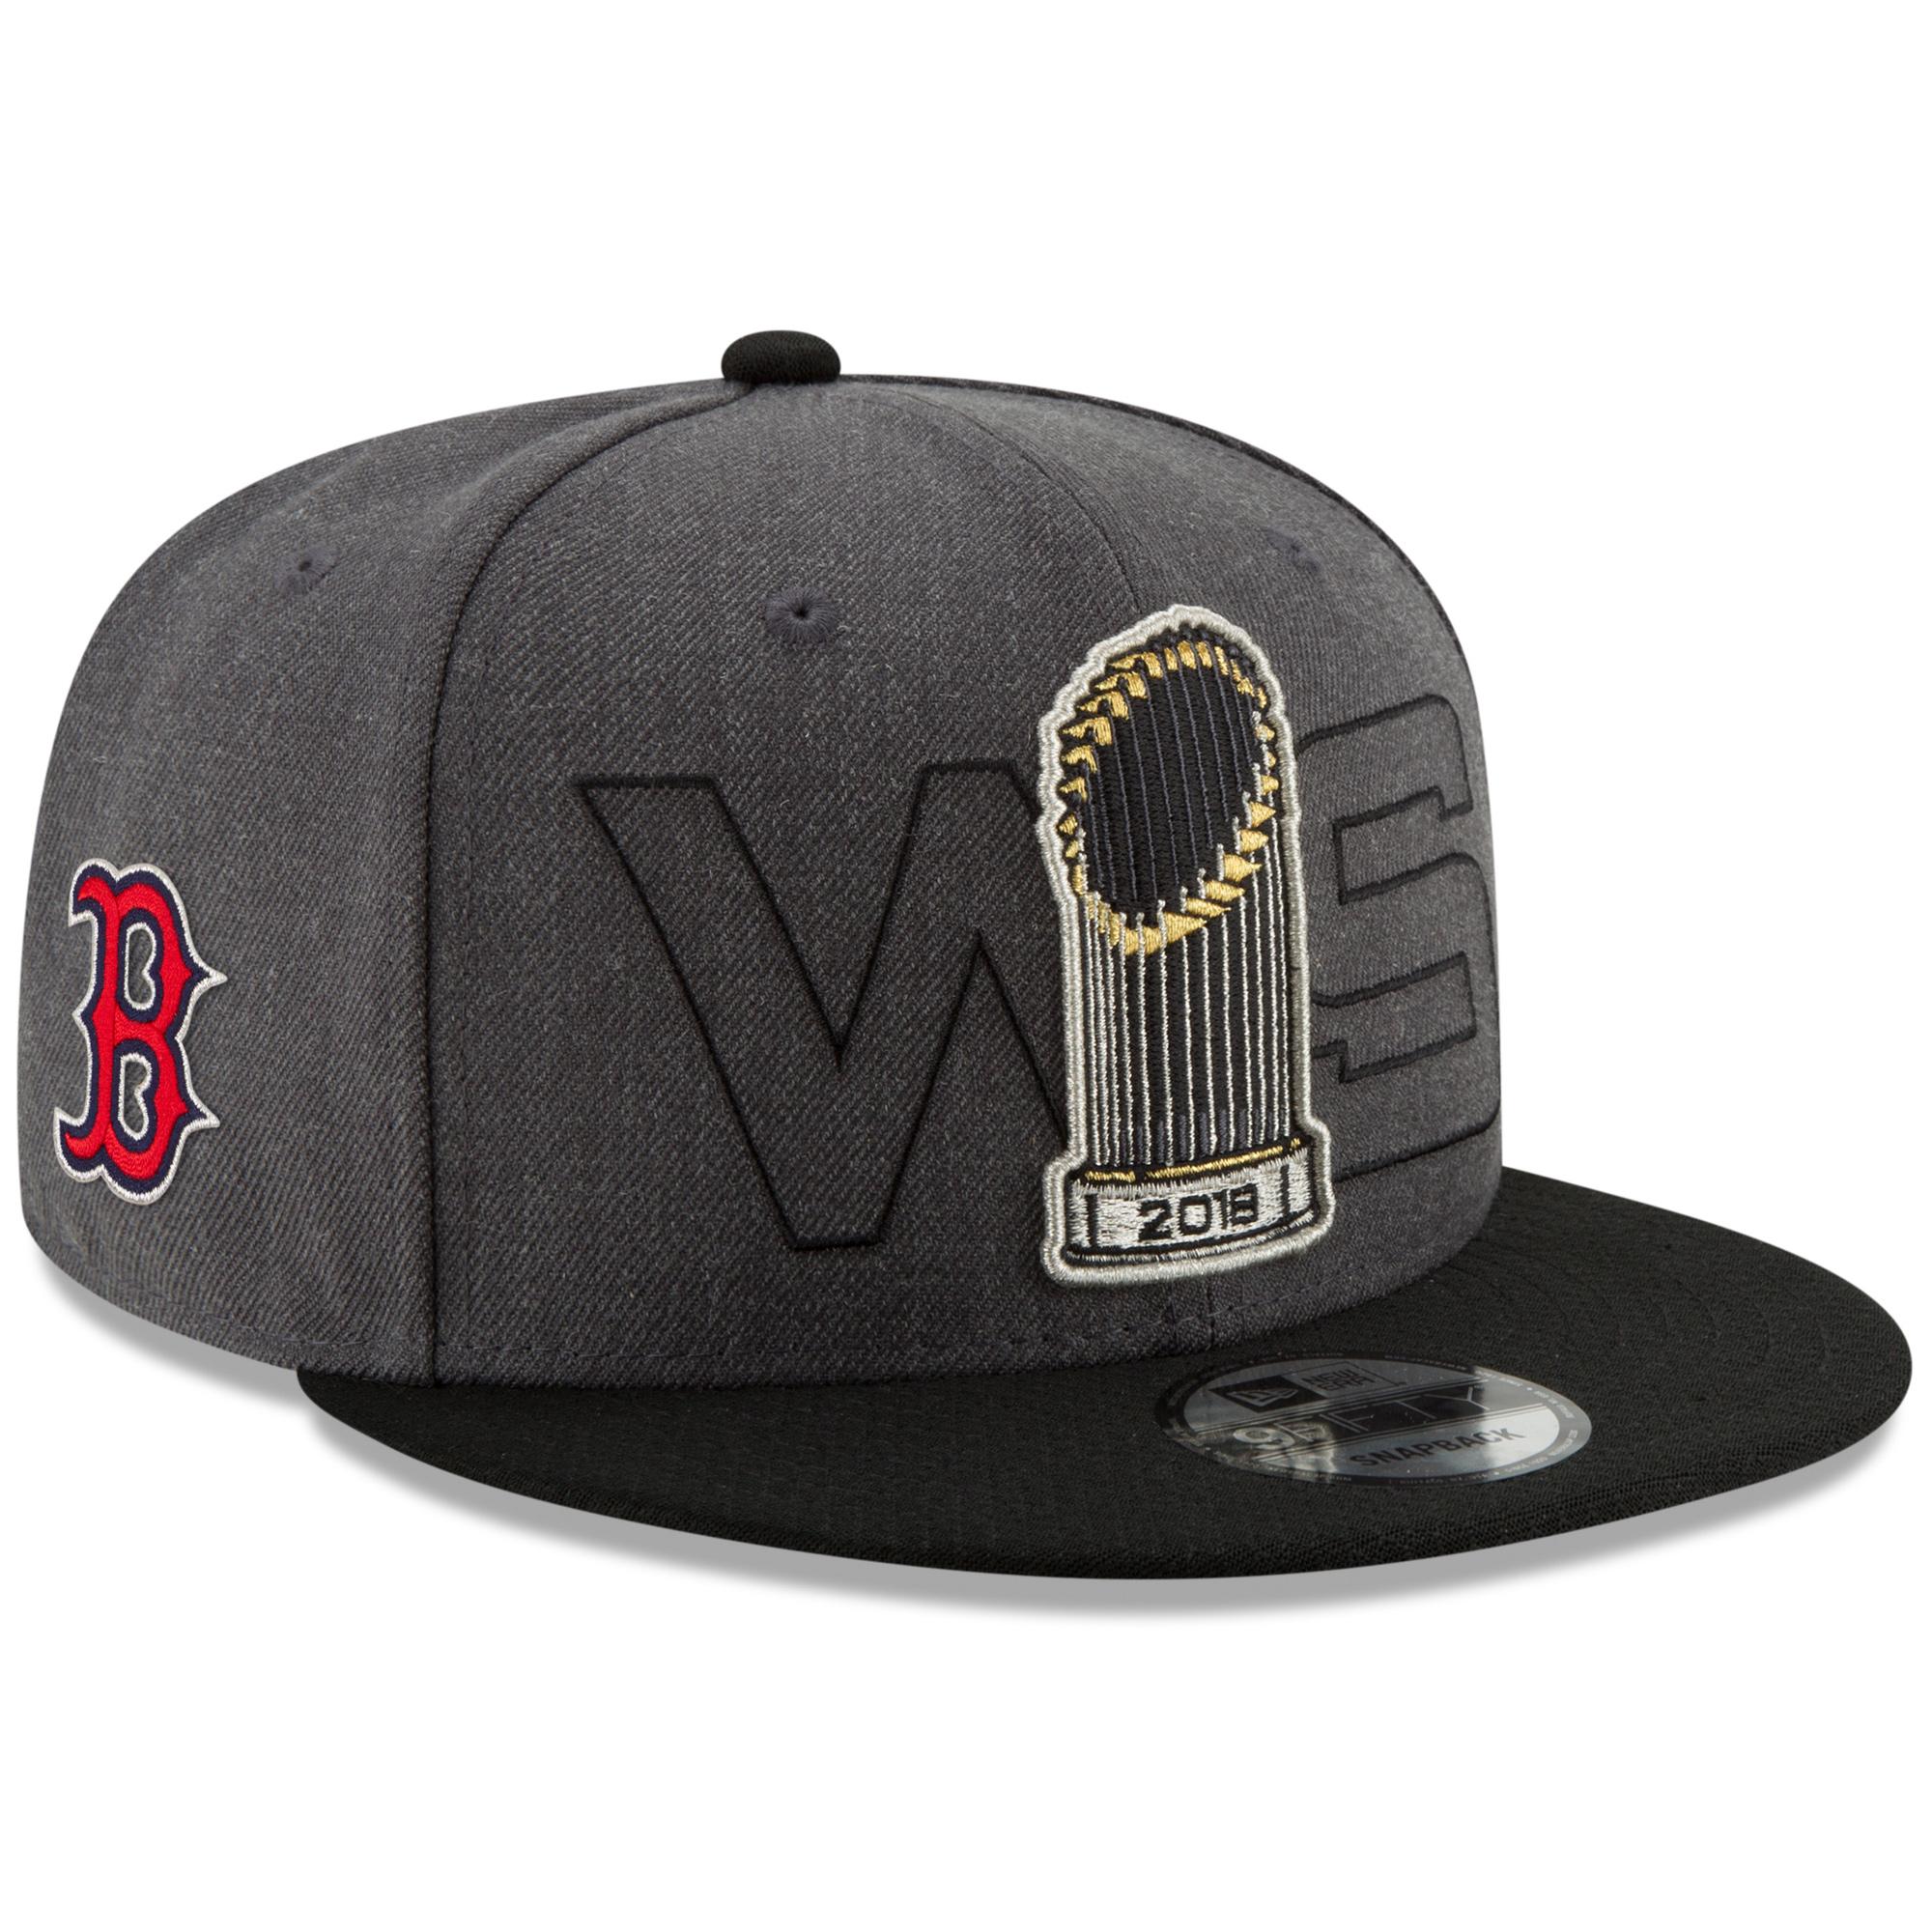 Boston Red Sox New Era 2018 World Series Champions Parade 9FIFTY Adjustable Hat - Charcoal - OSFA